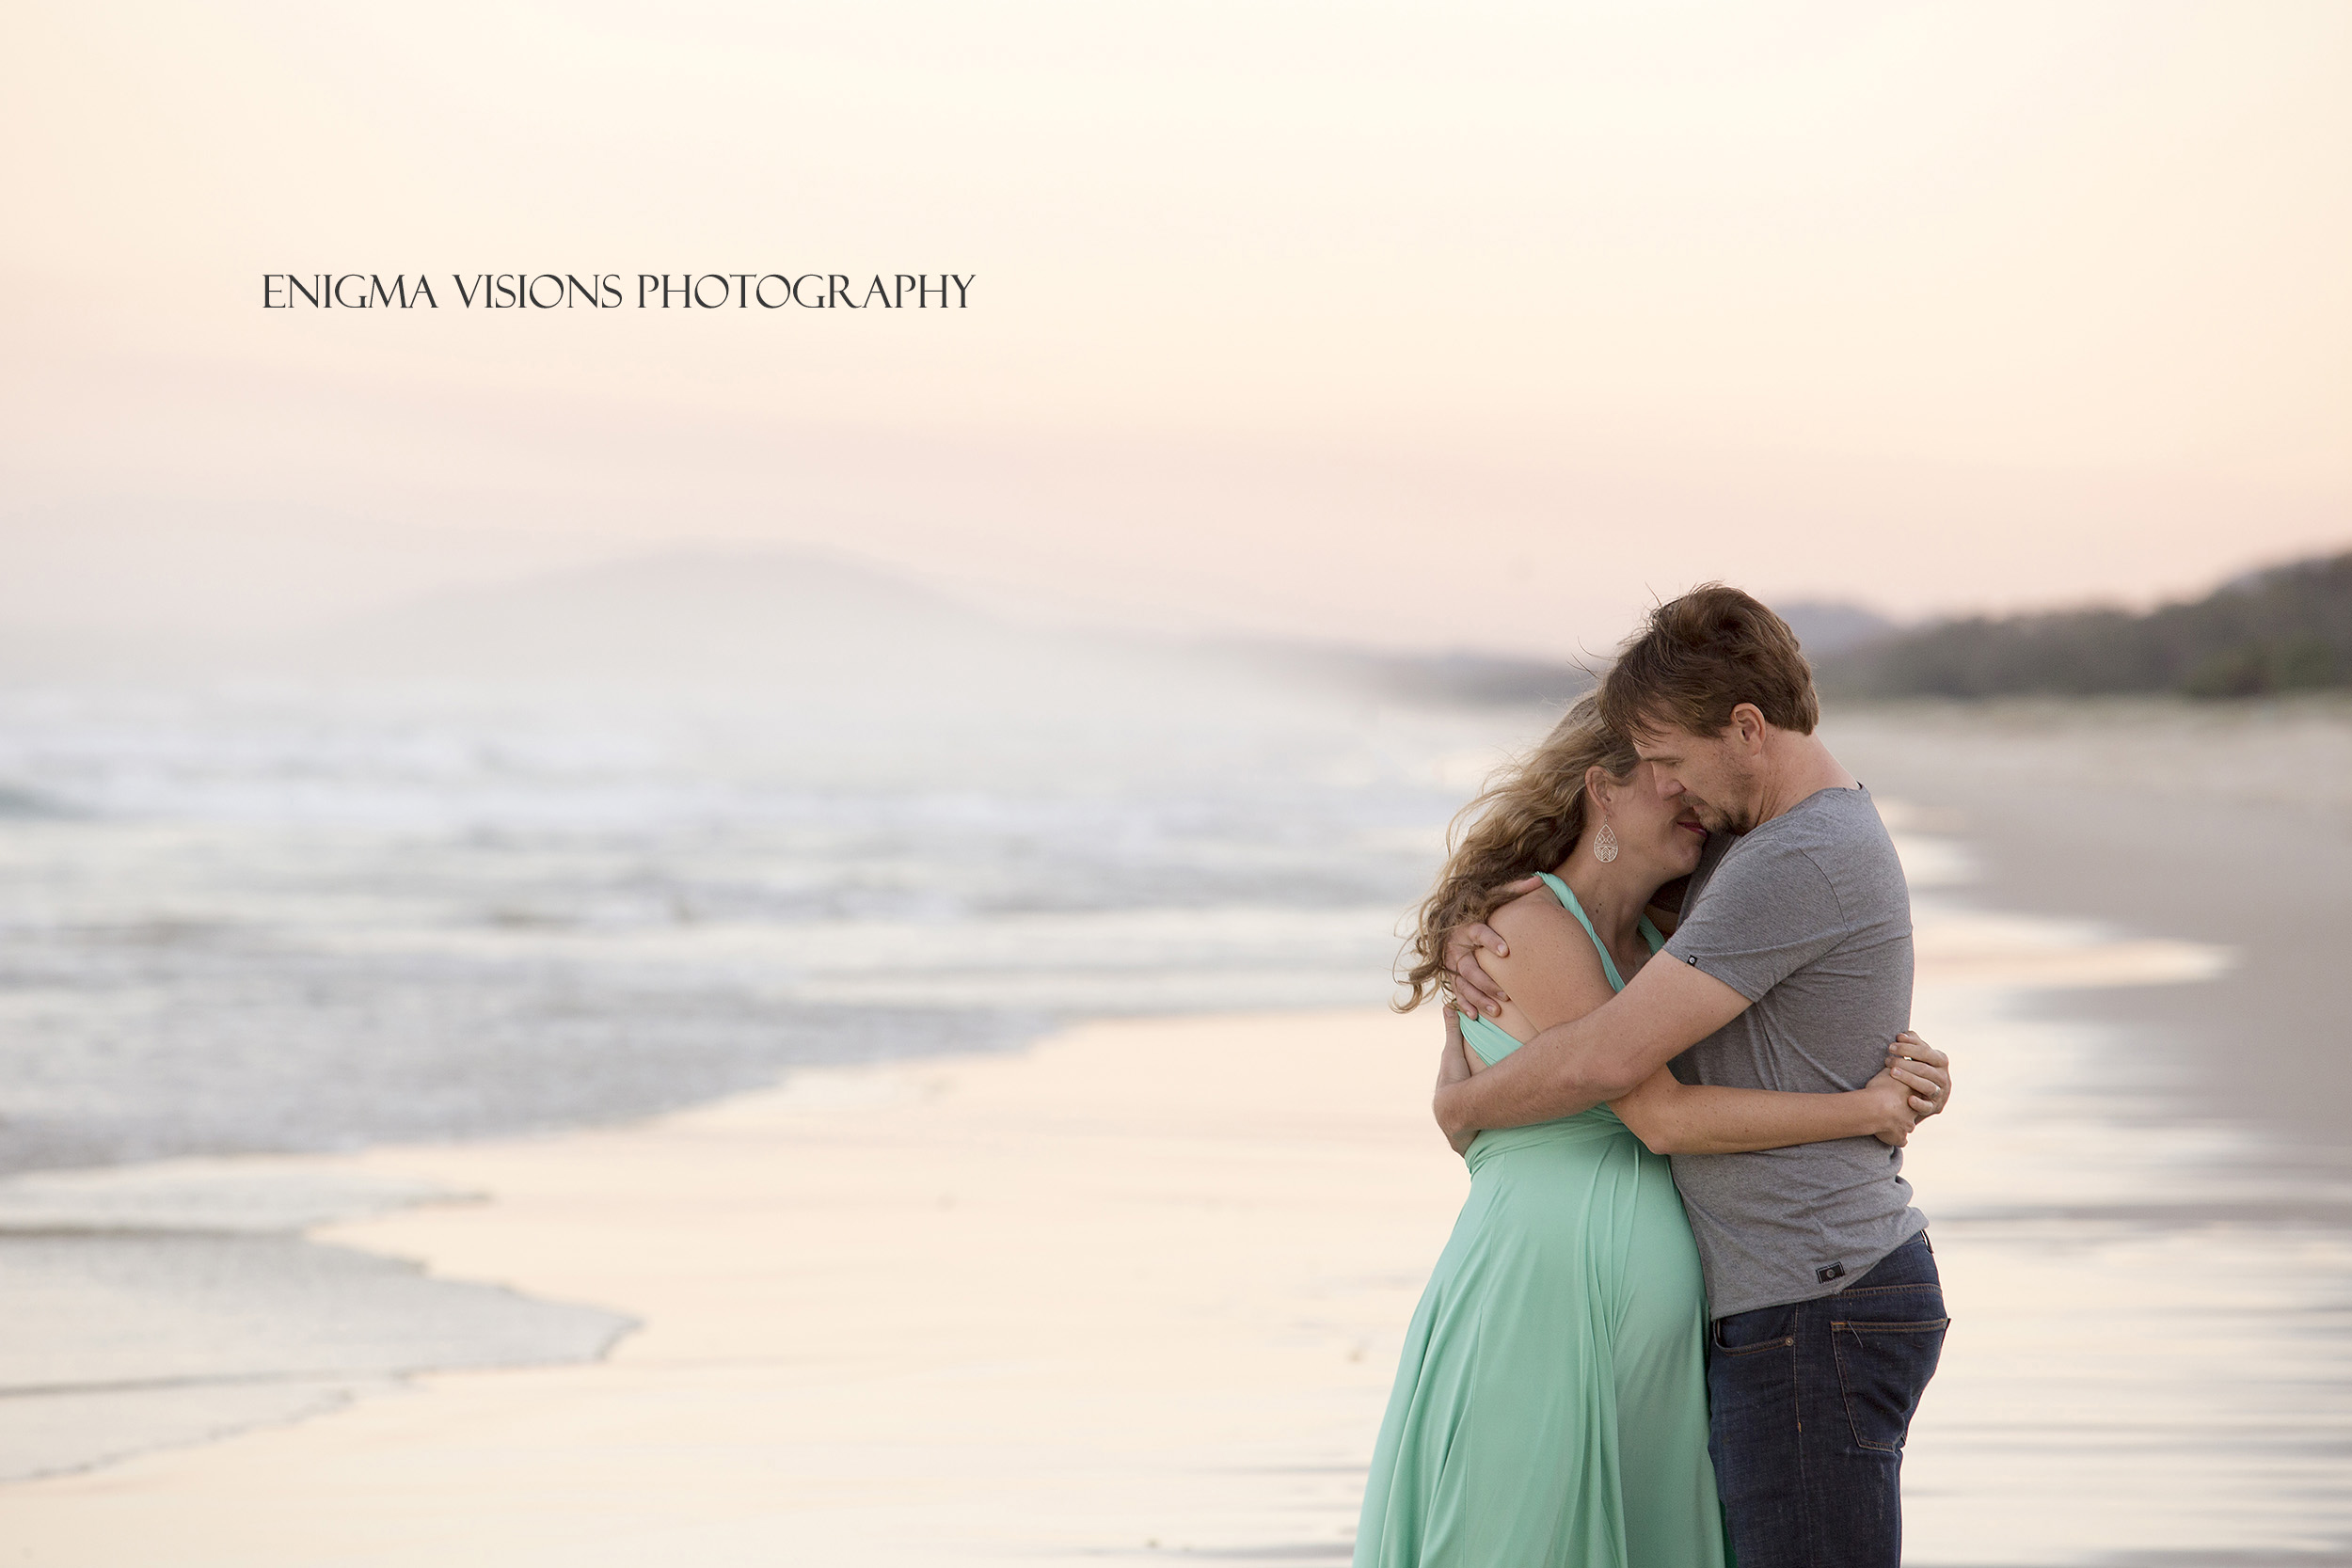 enigma_visions_photography_maternity_melandandrew_kingscliff (53).jpg